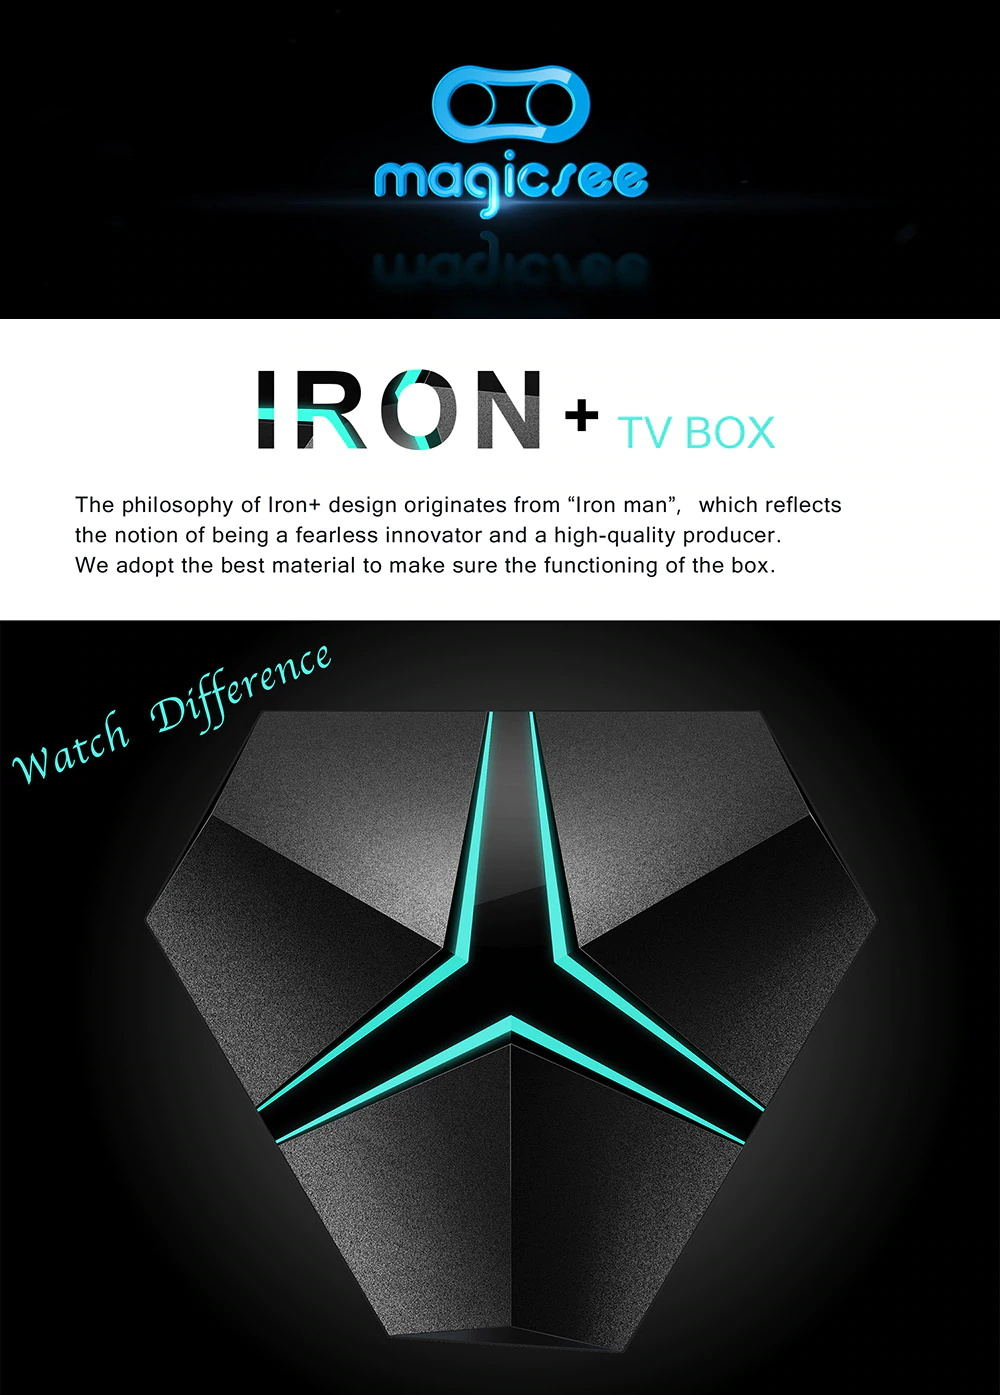 [Image: MAGICSEE-Iron-Plus-TV-Box-1.JPG]